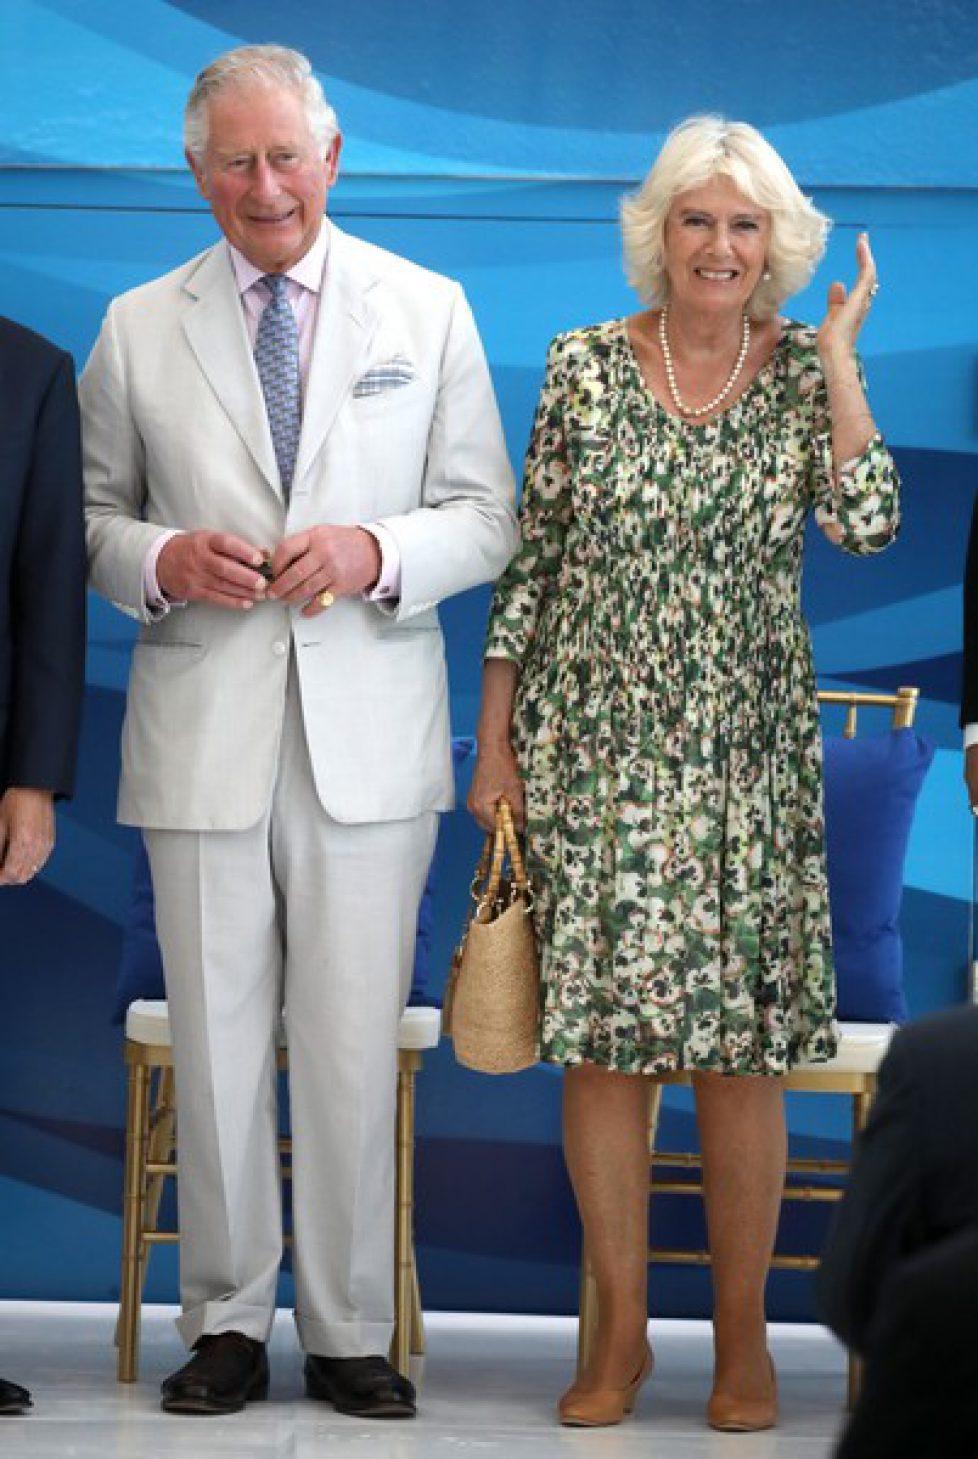 Prince+Wales+Duchess+Cornwall+Visit+Cayman+CxQ5mWiblIGl